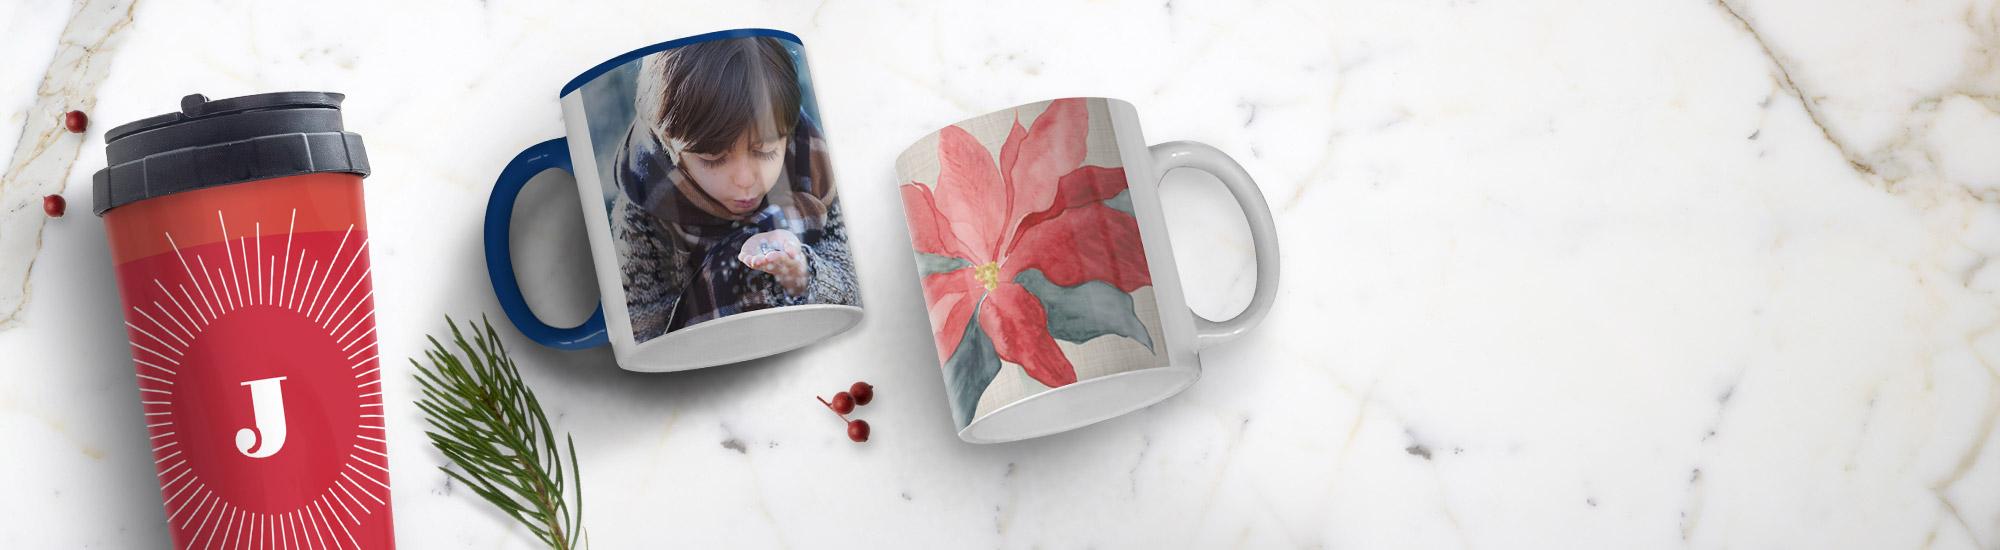 Personalised Mugs & Tableware